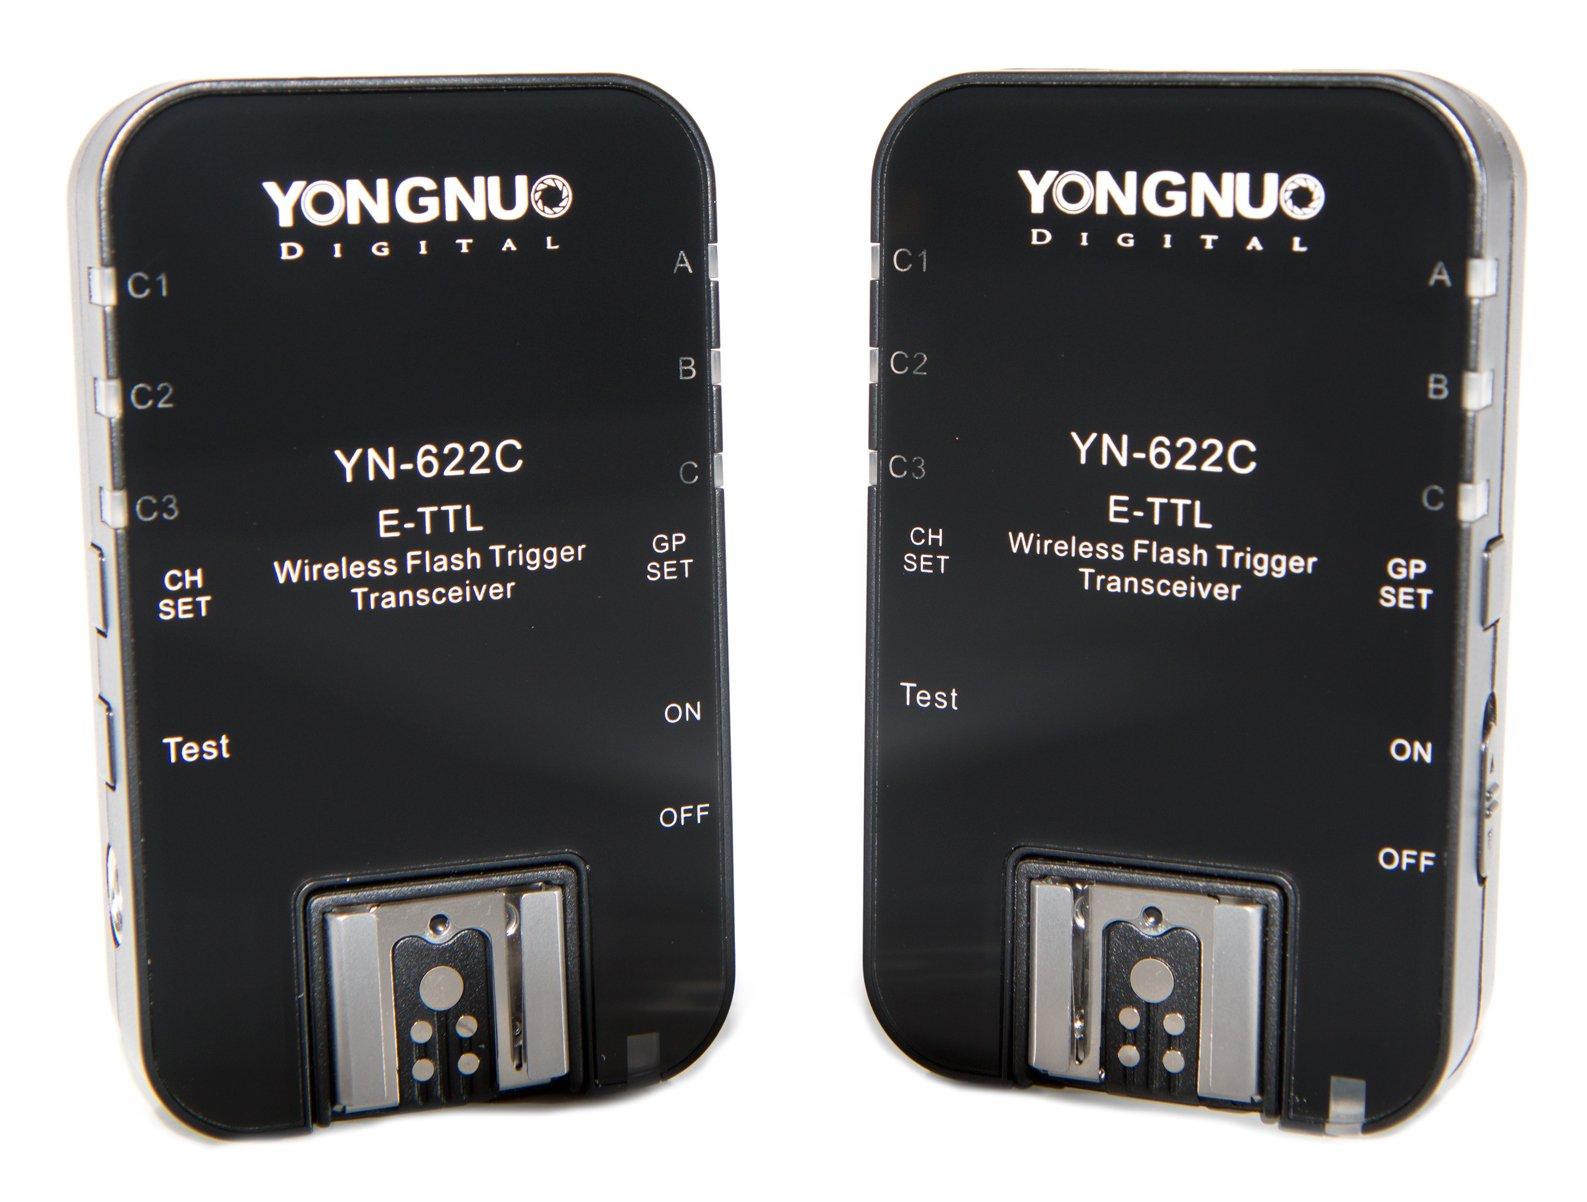 Yongnuo YN-622C-USA E-TTL 2.4-GHz Wireless Flash Trigger Transceiver Pair for Canon DSLRs, US Warranty (Black)